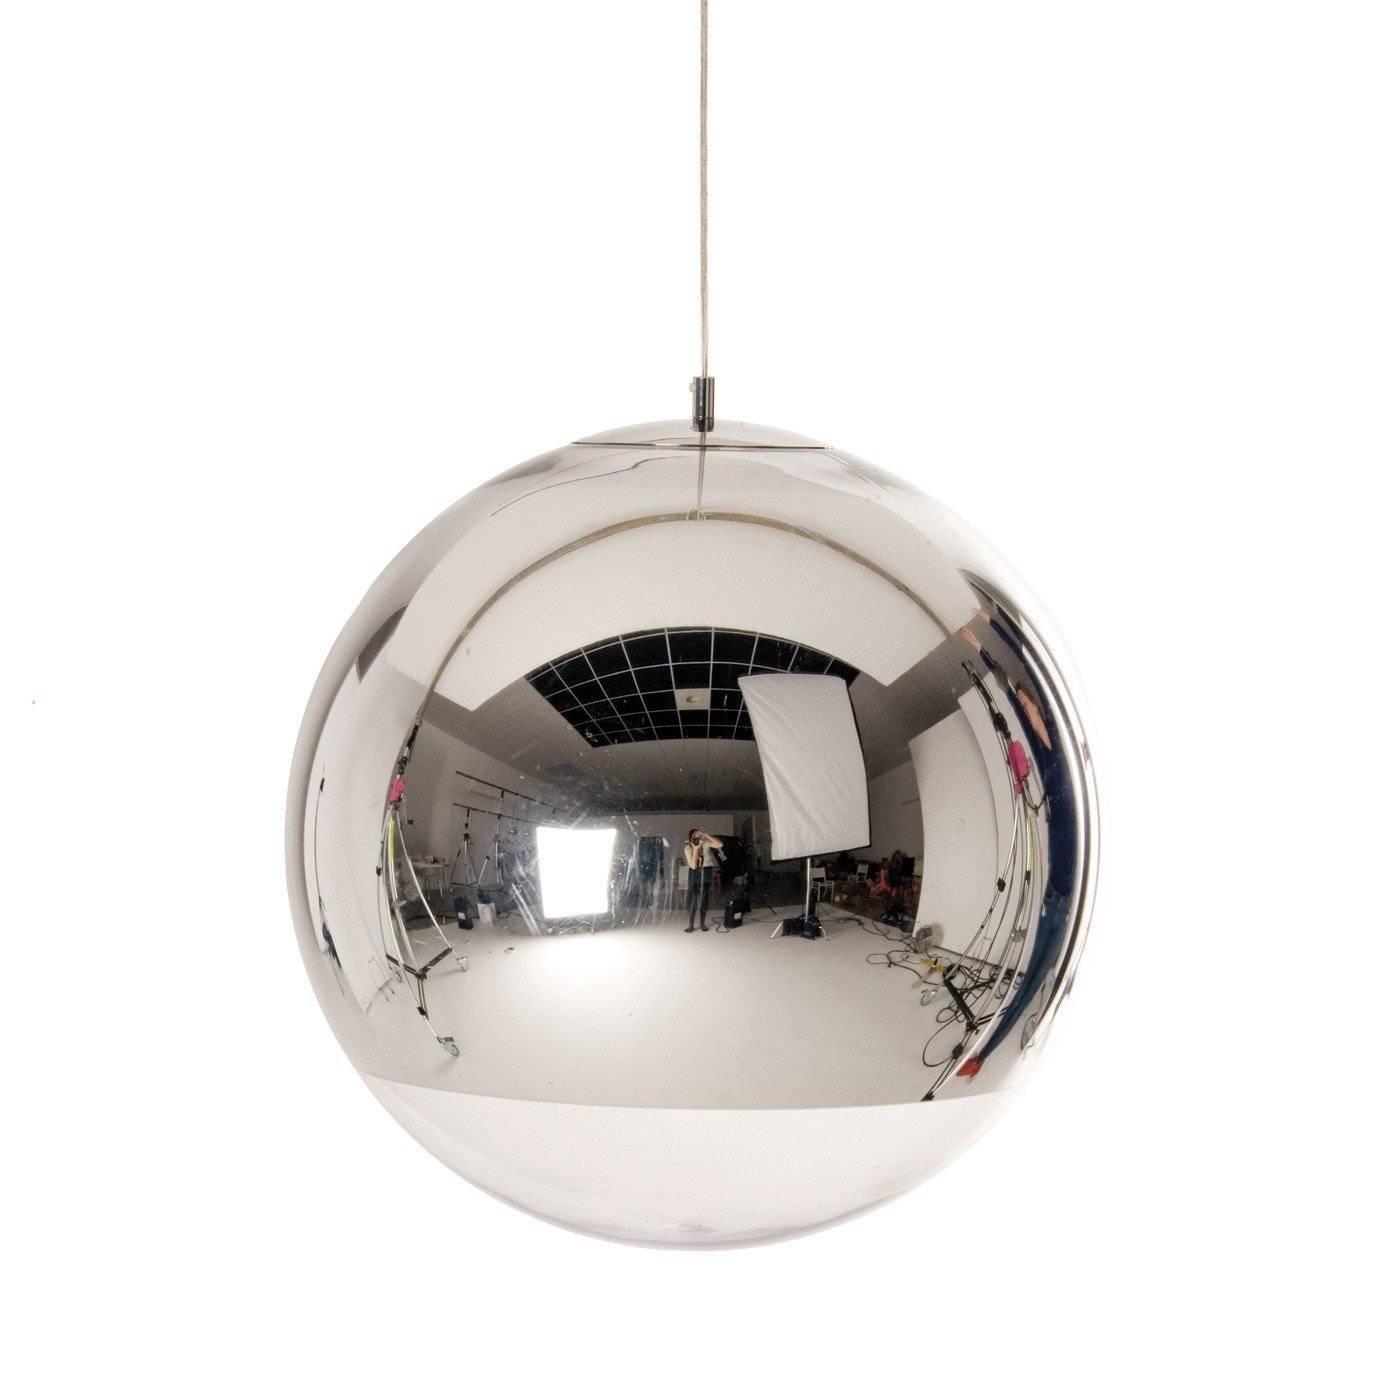 Mirror Ball Pendant Light with regard to Disco Ball Pendants (Image 6 of 15)